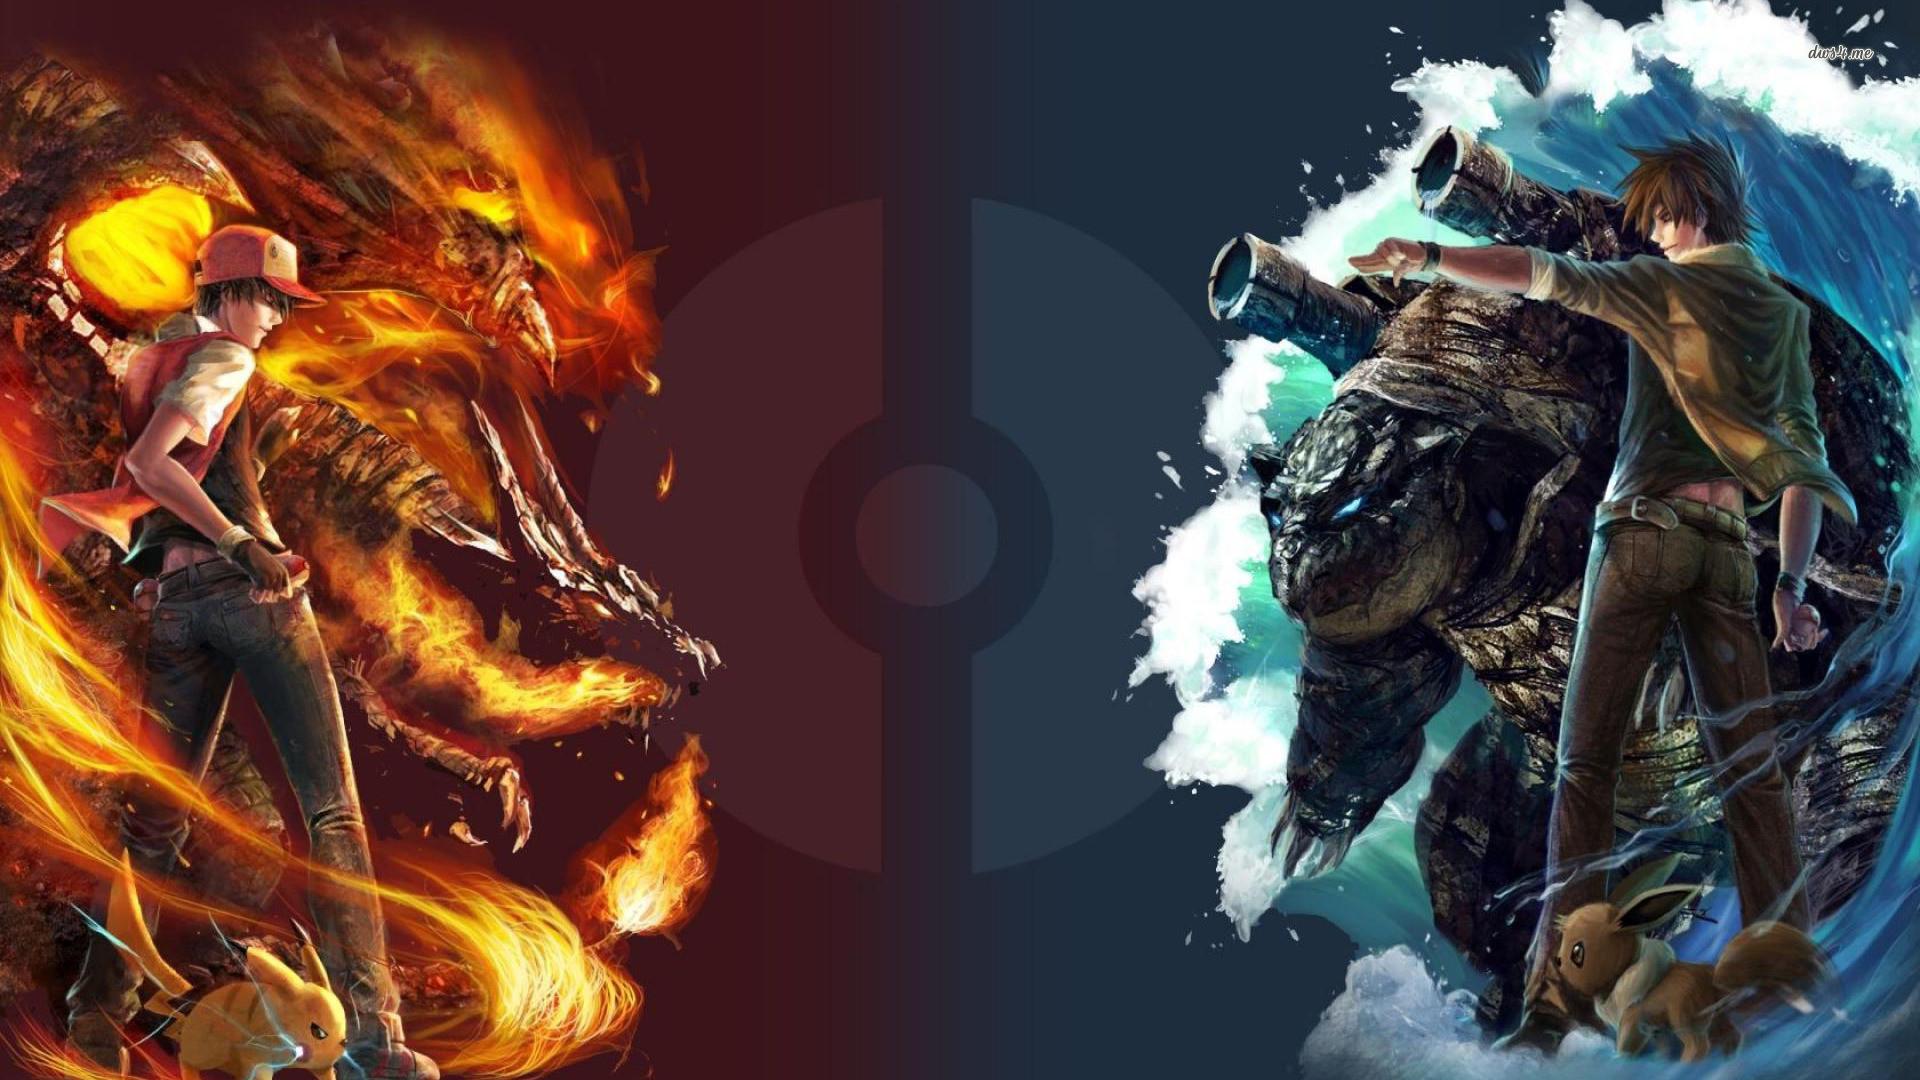 Pokemon HD Wallpapers 1080p – WallpaperSafari